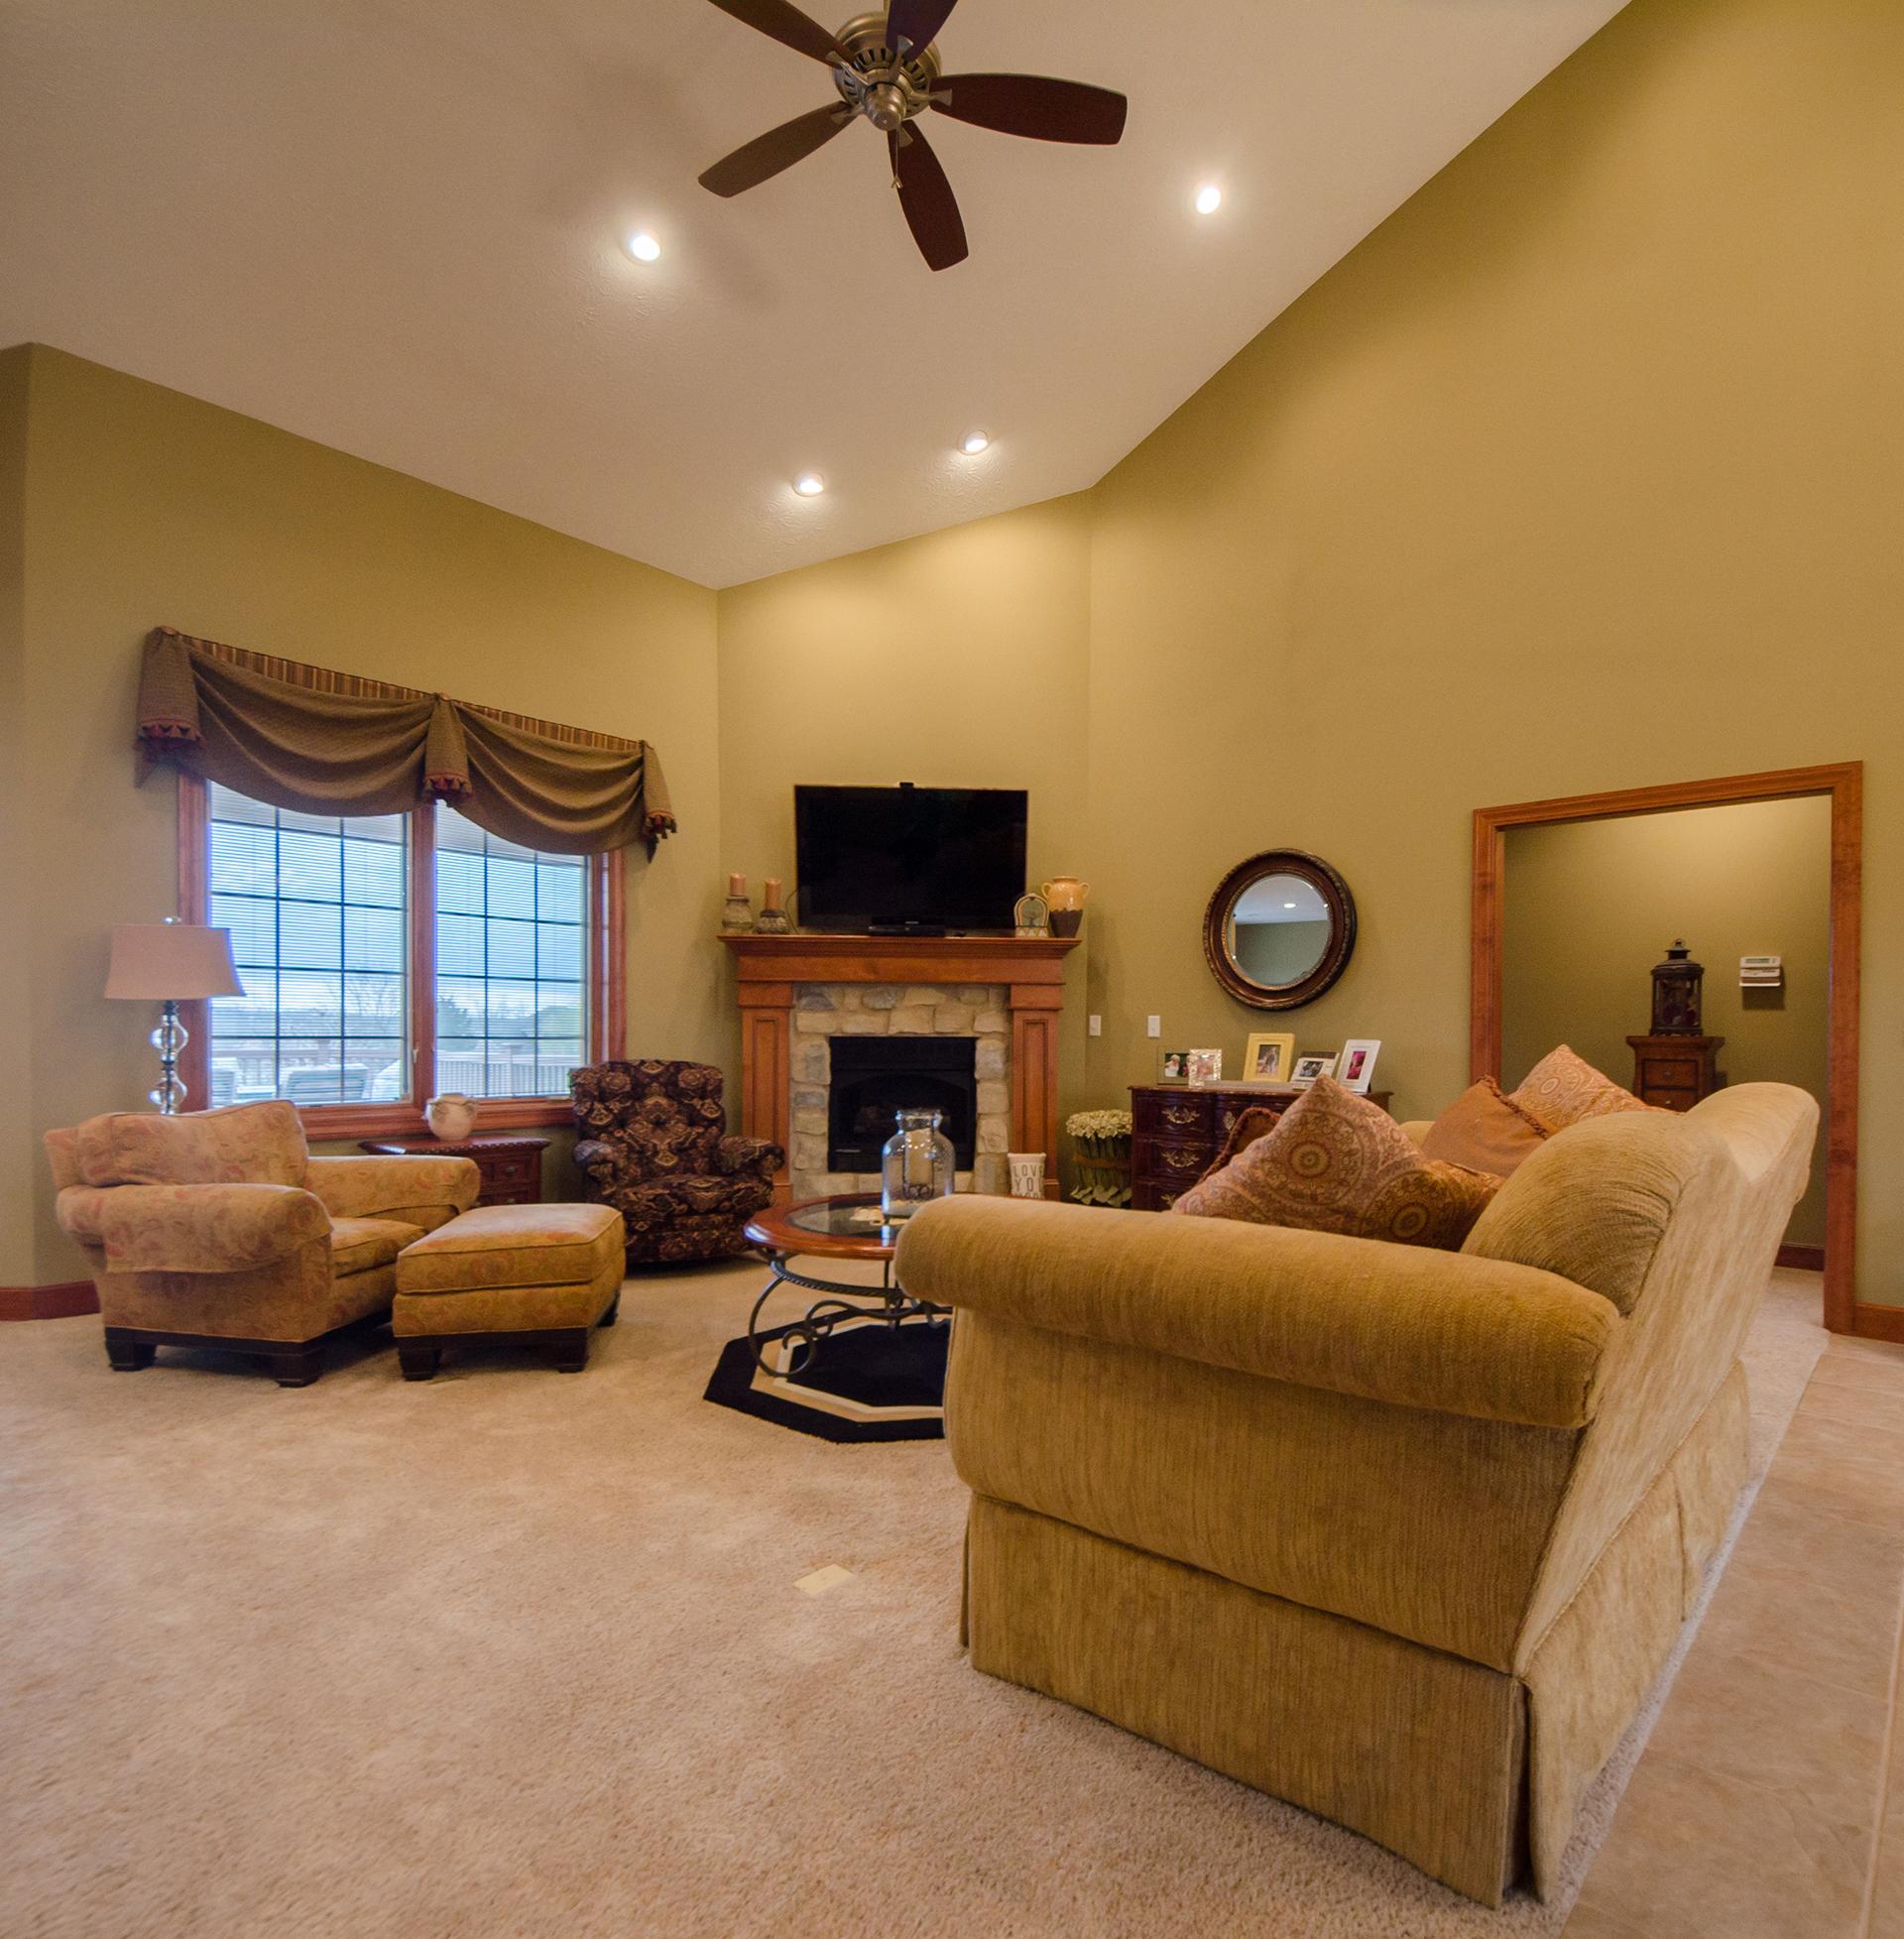 Listed By Design Homes U0026 Development.